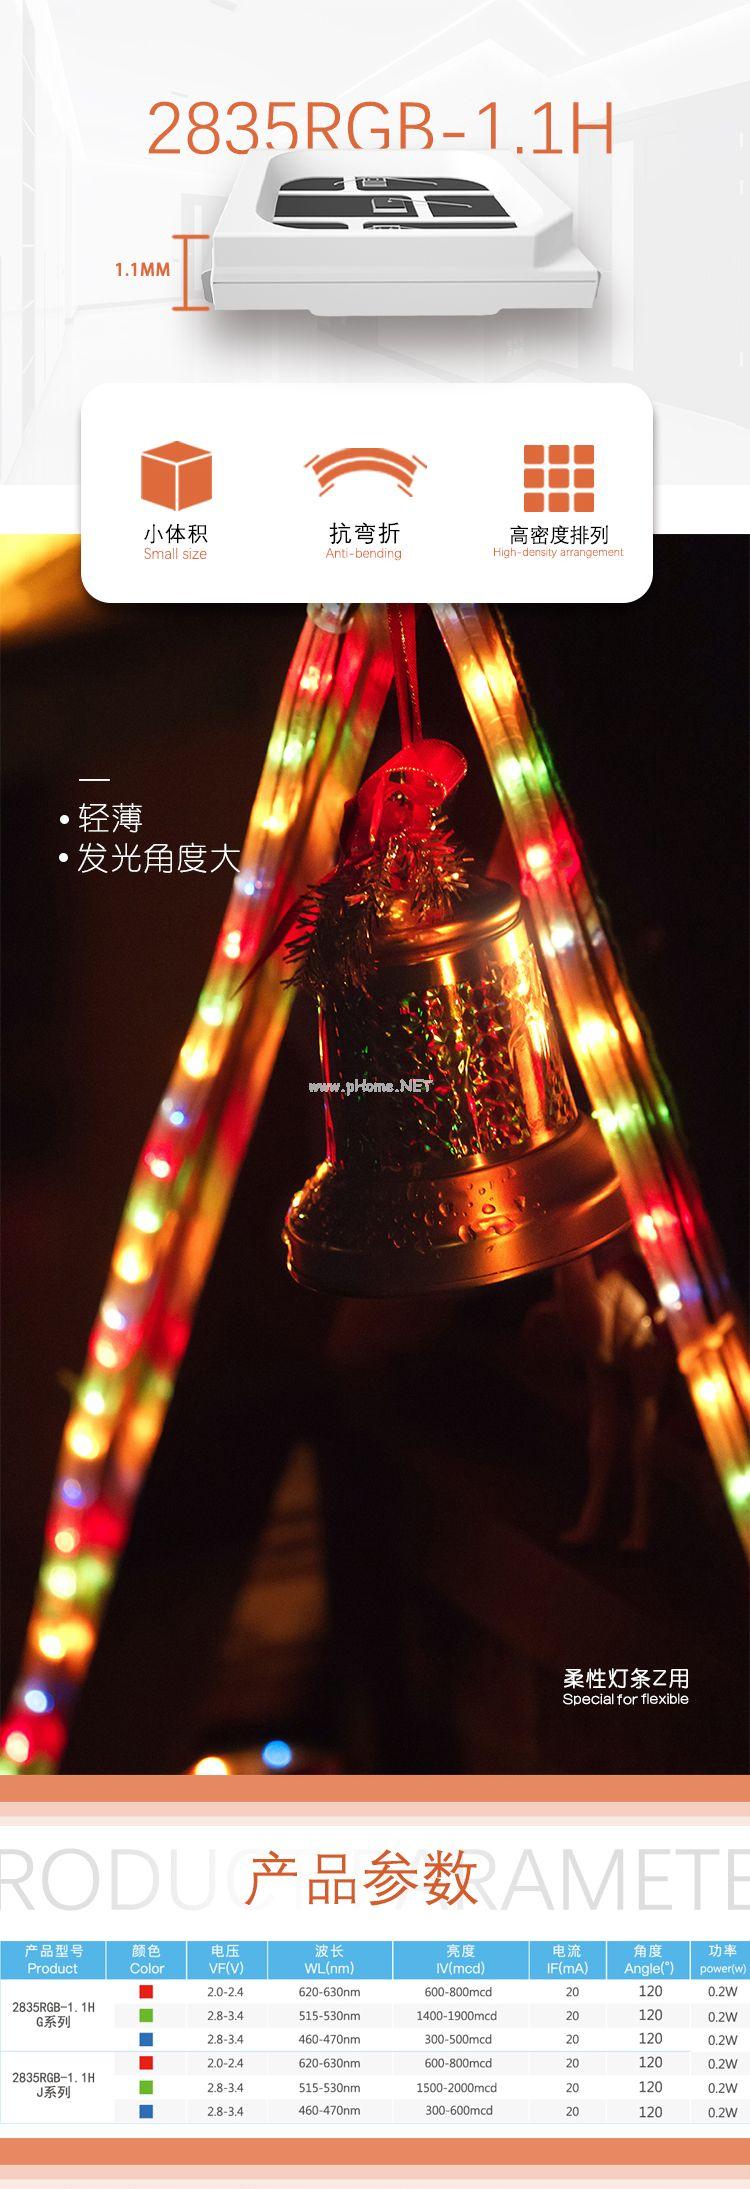 RGB+WW_01 (4).jpg